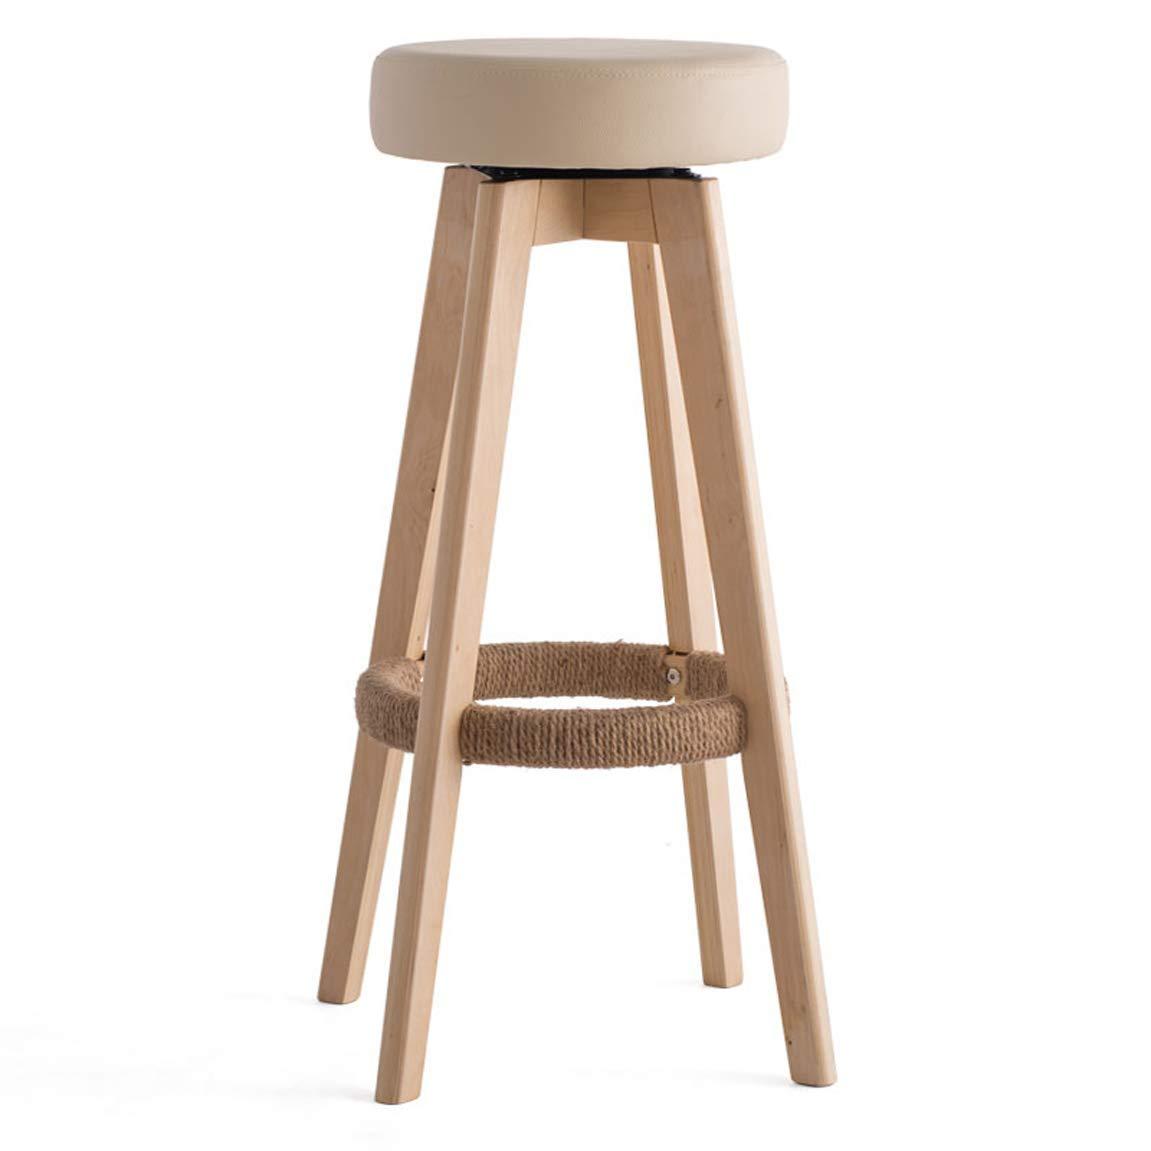 Carl Artbay Bar Chair Bar Chair High Stand Household Solid Wood Bar Stand Modern Simple redary Creative European Chair 74 cm High 3 Strong and Practical